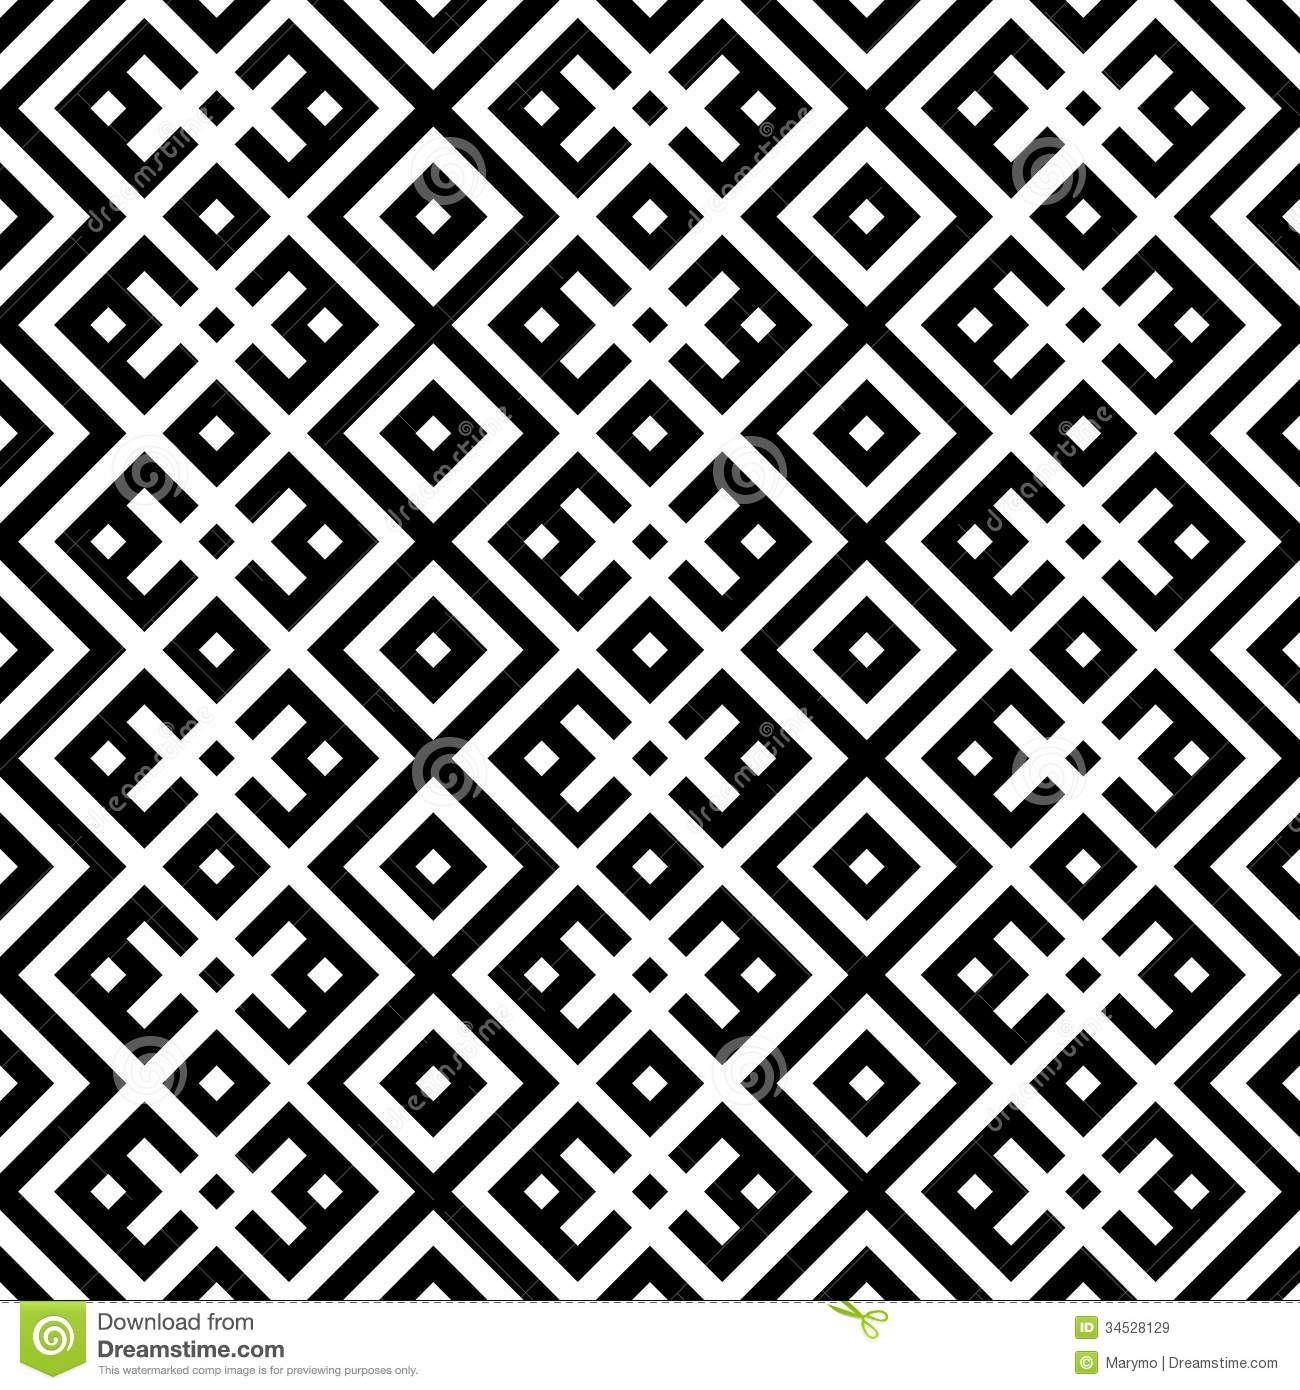 Black And White Checkered Wallpaper Border Seamless